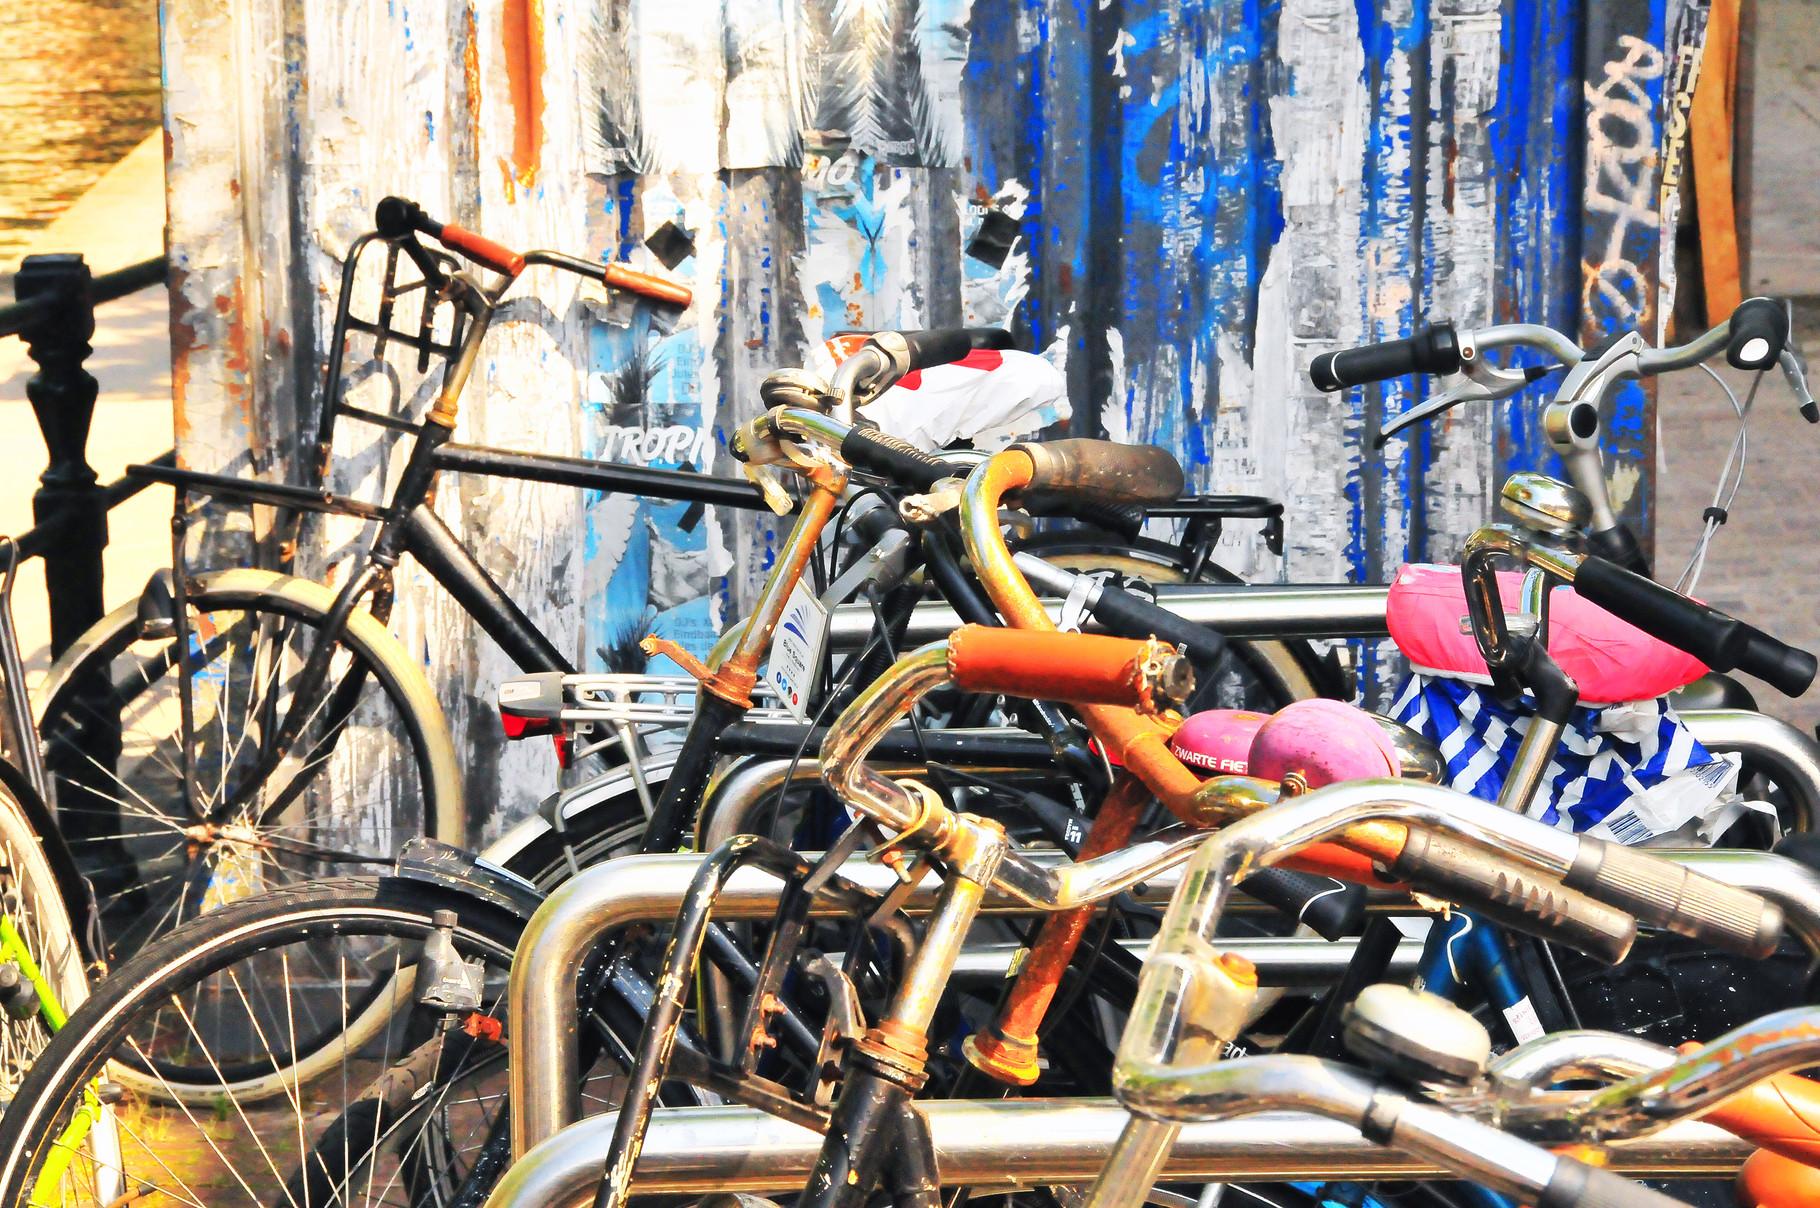 3 Use(d) Bikes